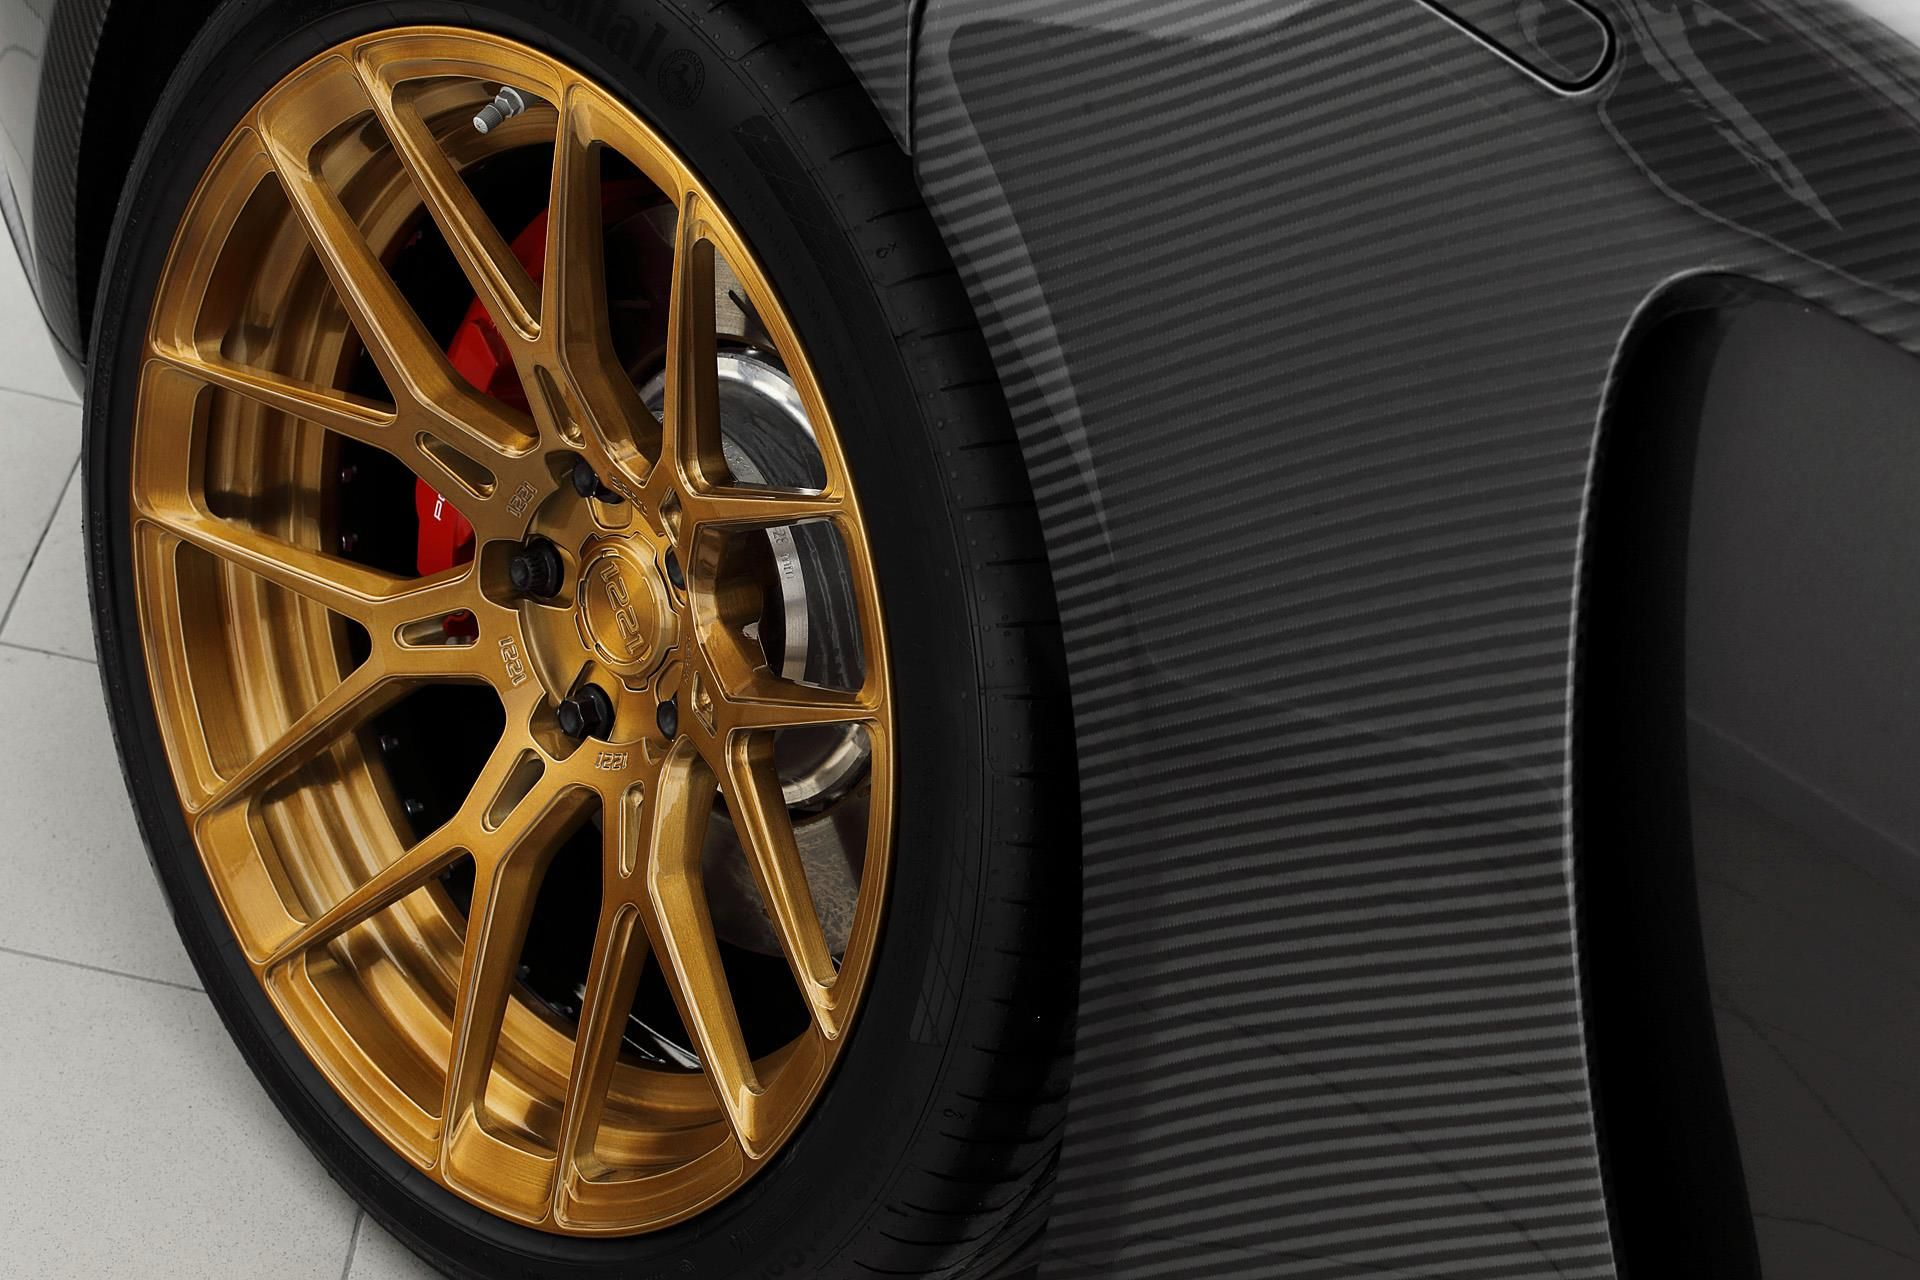 Porsche_Panamera_GTR_Carbon_Edition_by_TopCar_0010